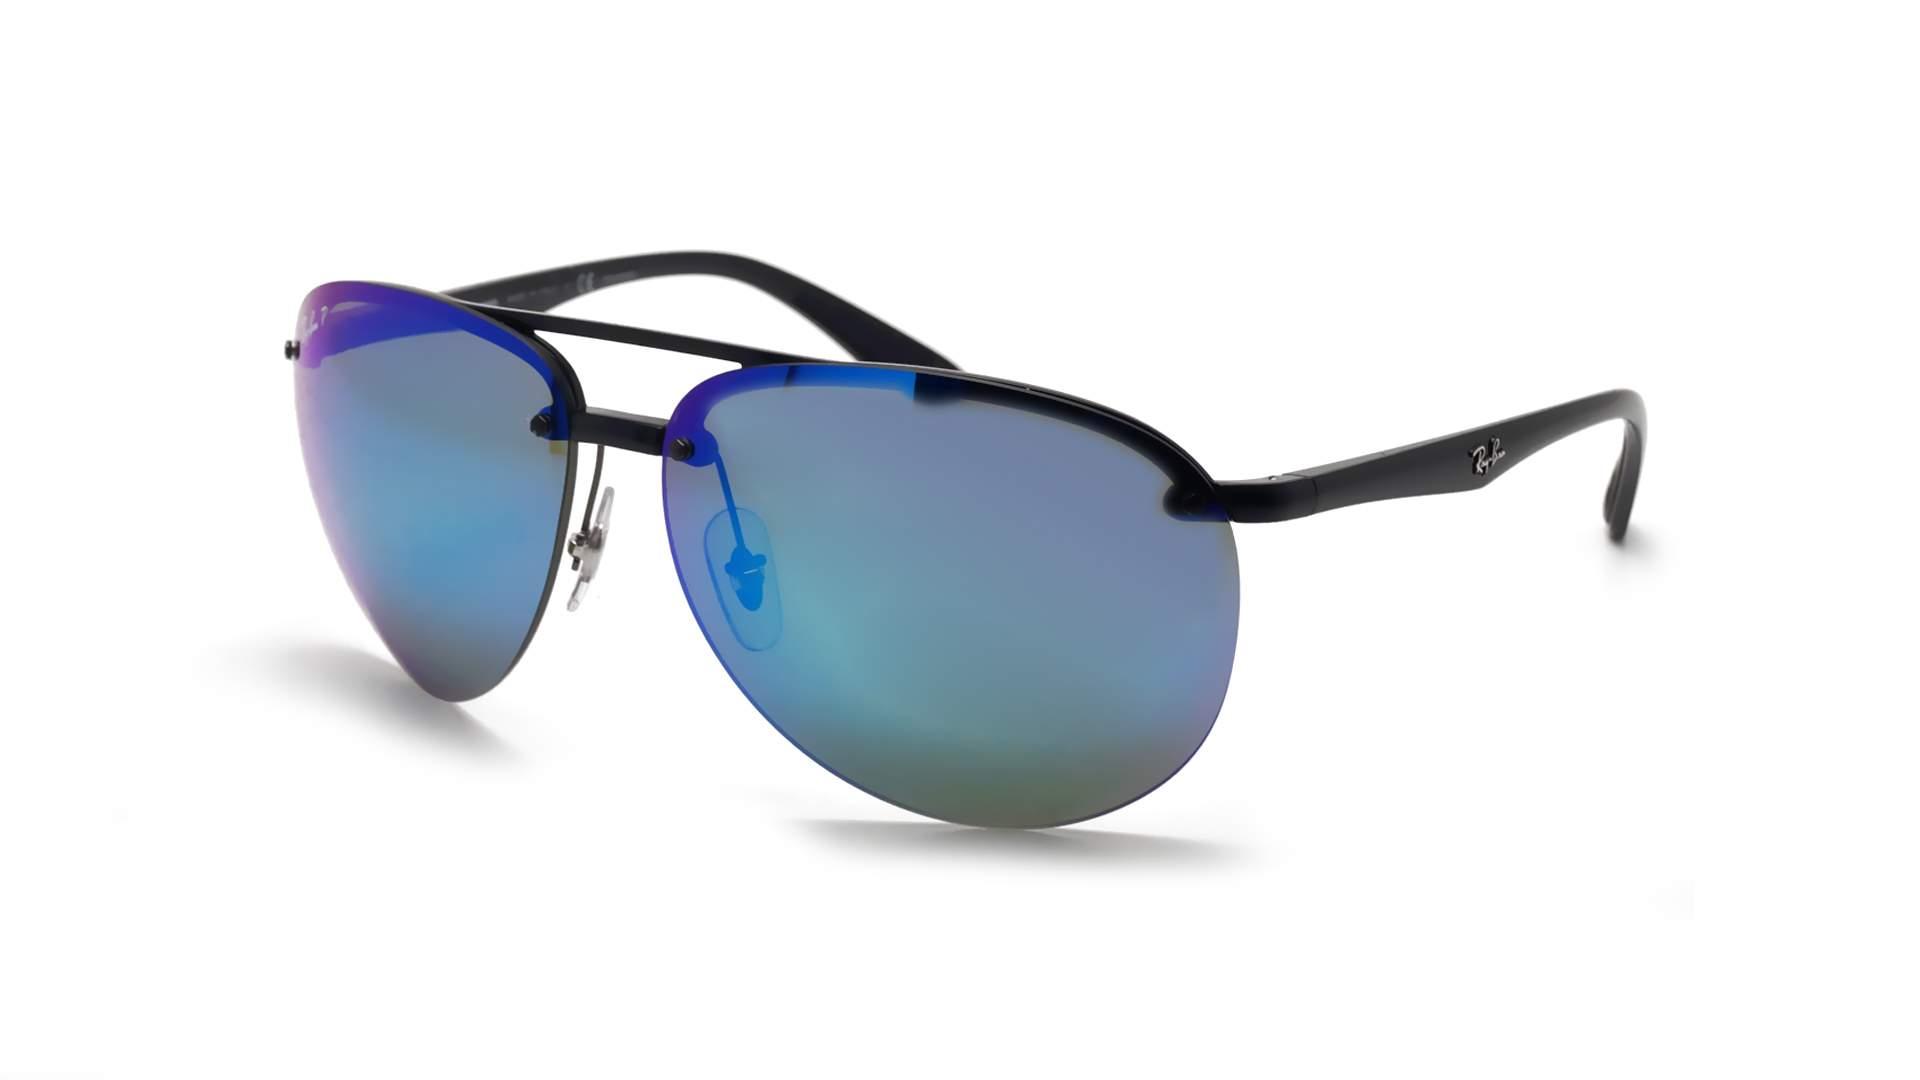 30c5f3f0609 Sunglasses Ray-Ban RB4293CH 601 A1 65-13 Black Chromance Large Polarized  Mirror